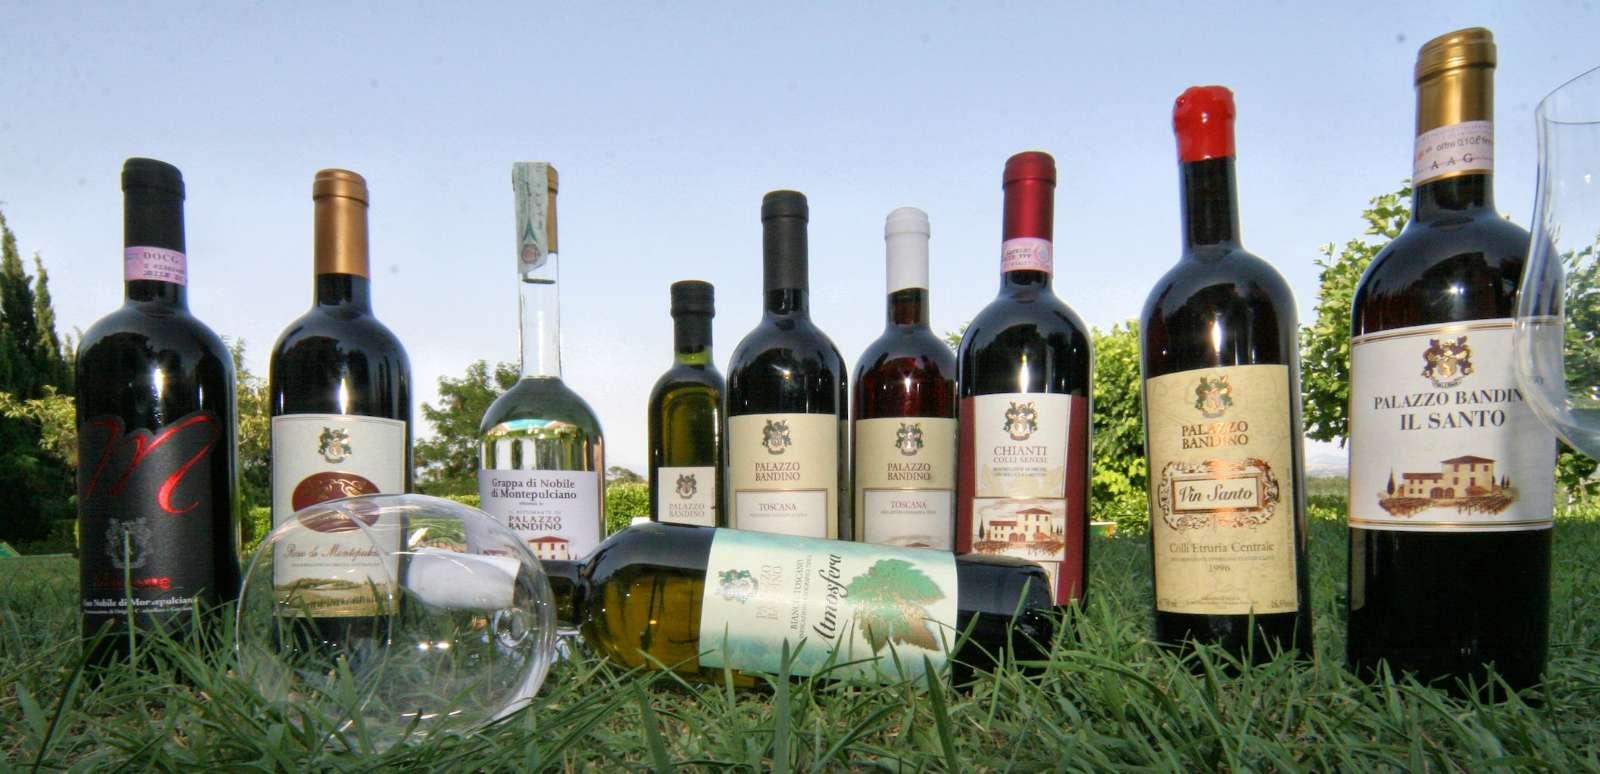 G&aring;rdens viner, <em>grappa</em> och det ber&ouml;mda <em>vin santo</em>.